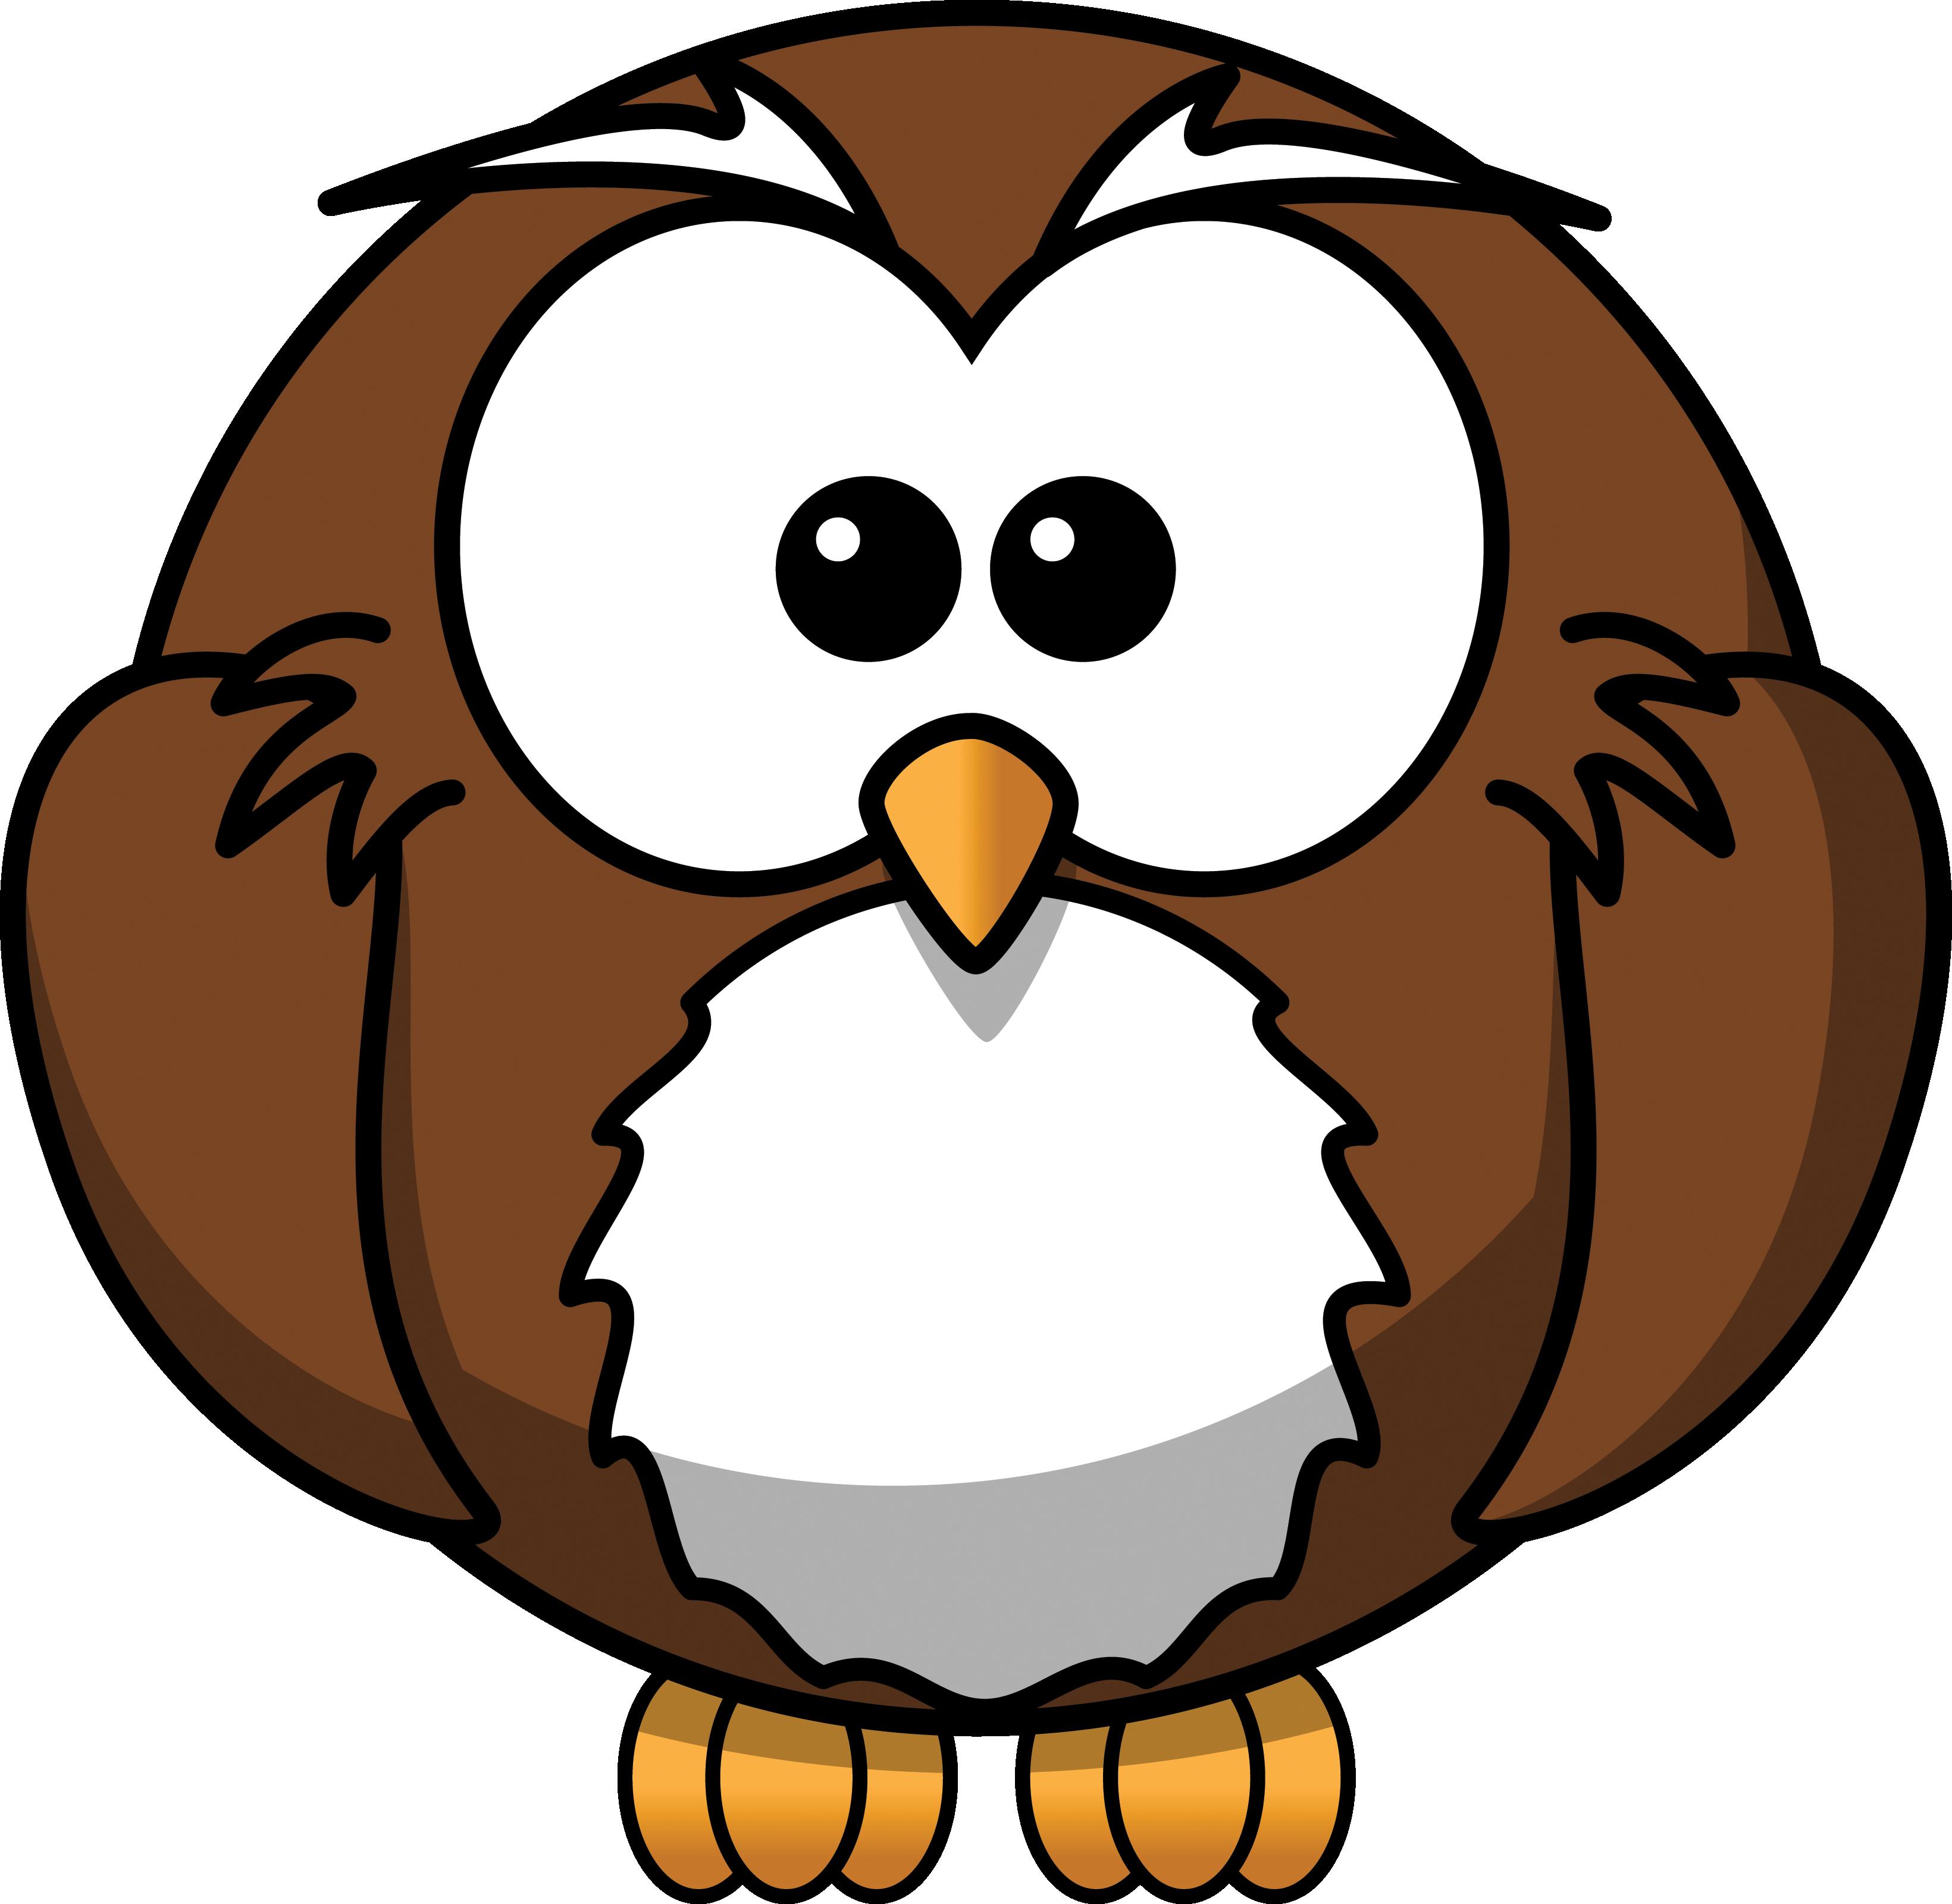 Cute Owl Mascot.